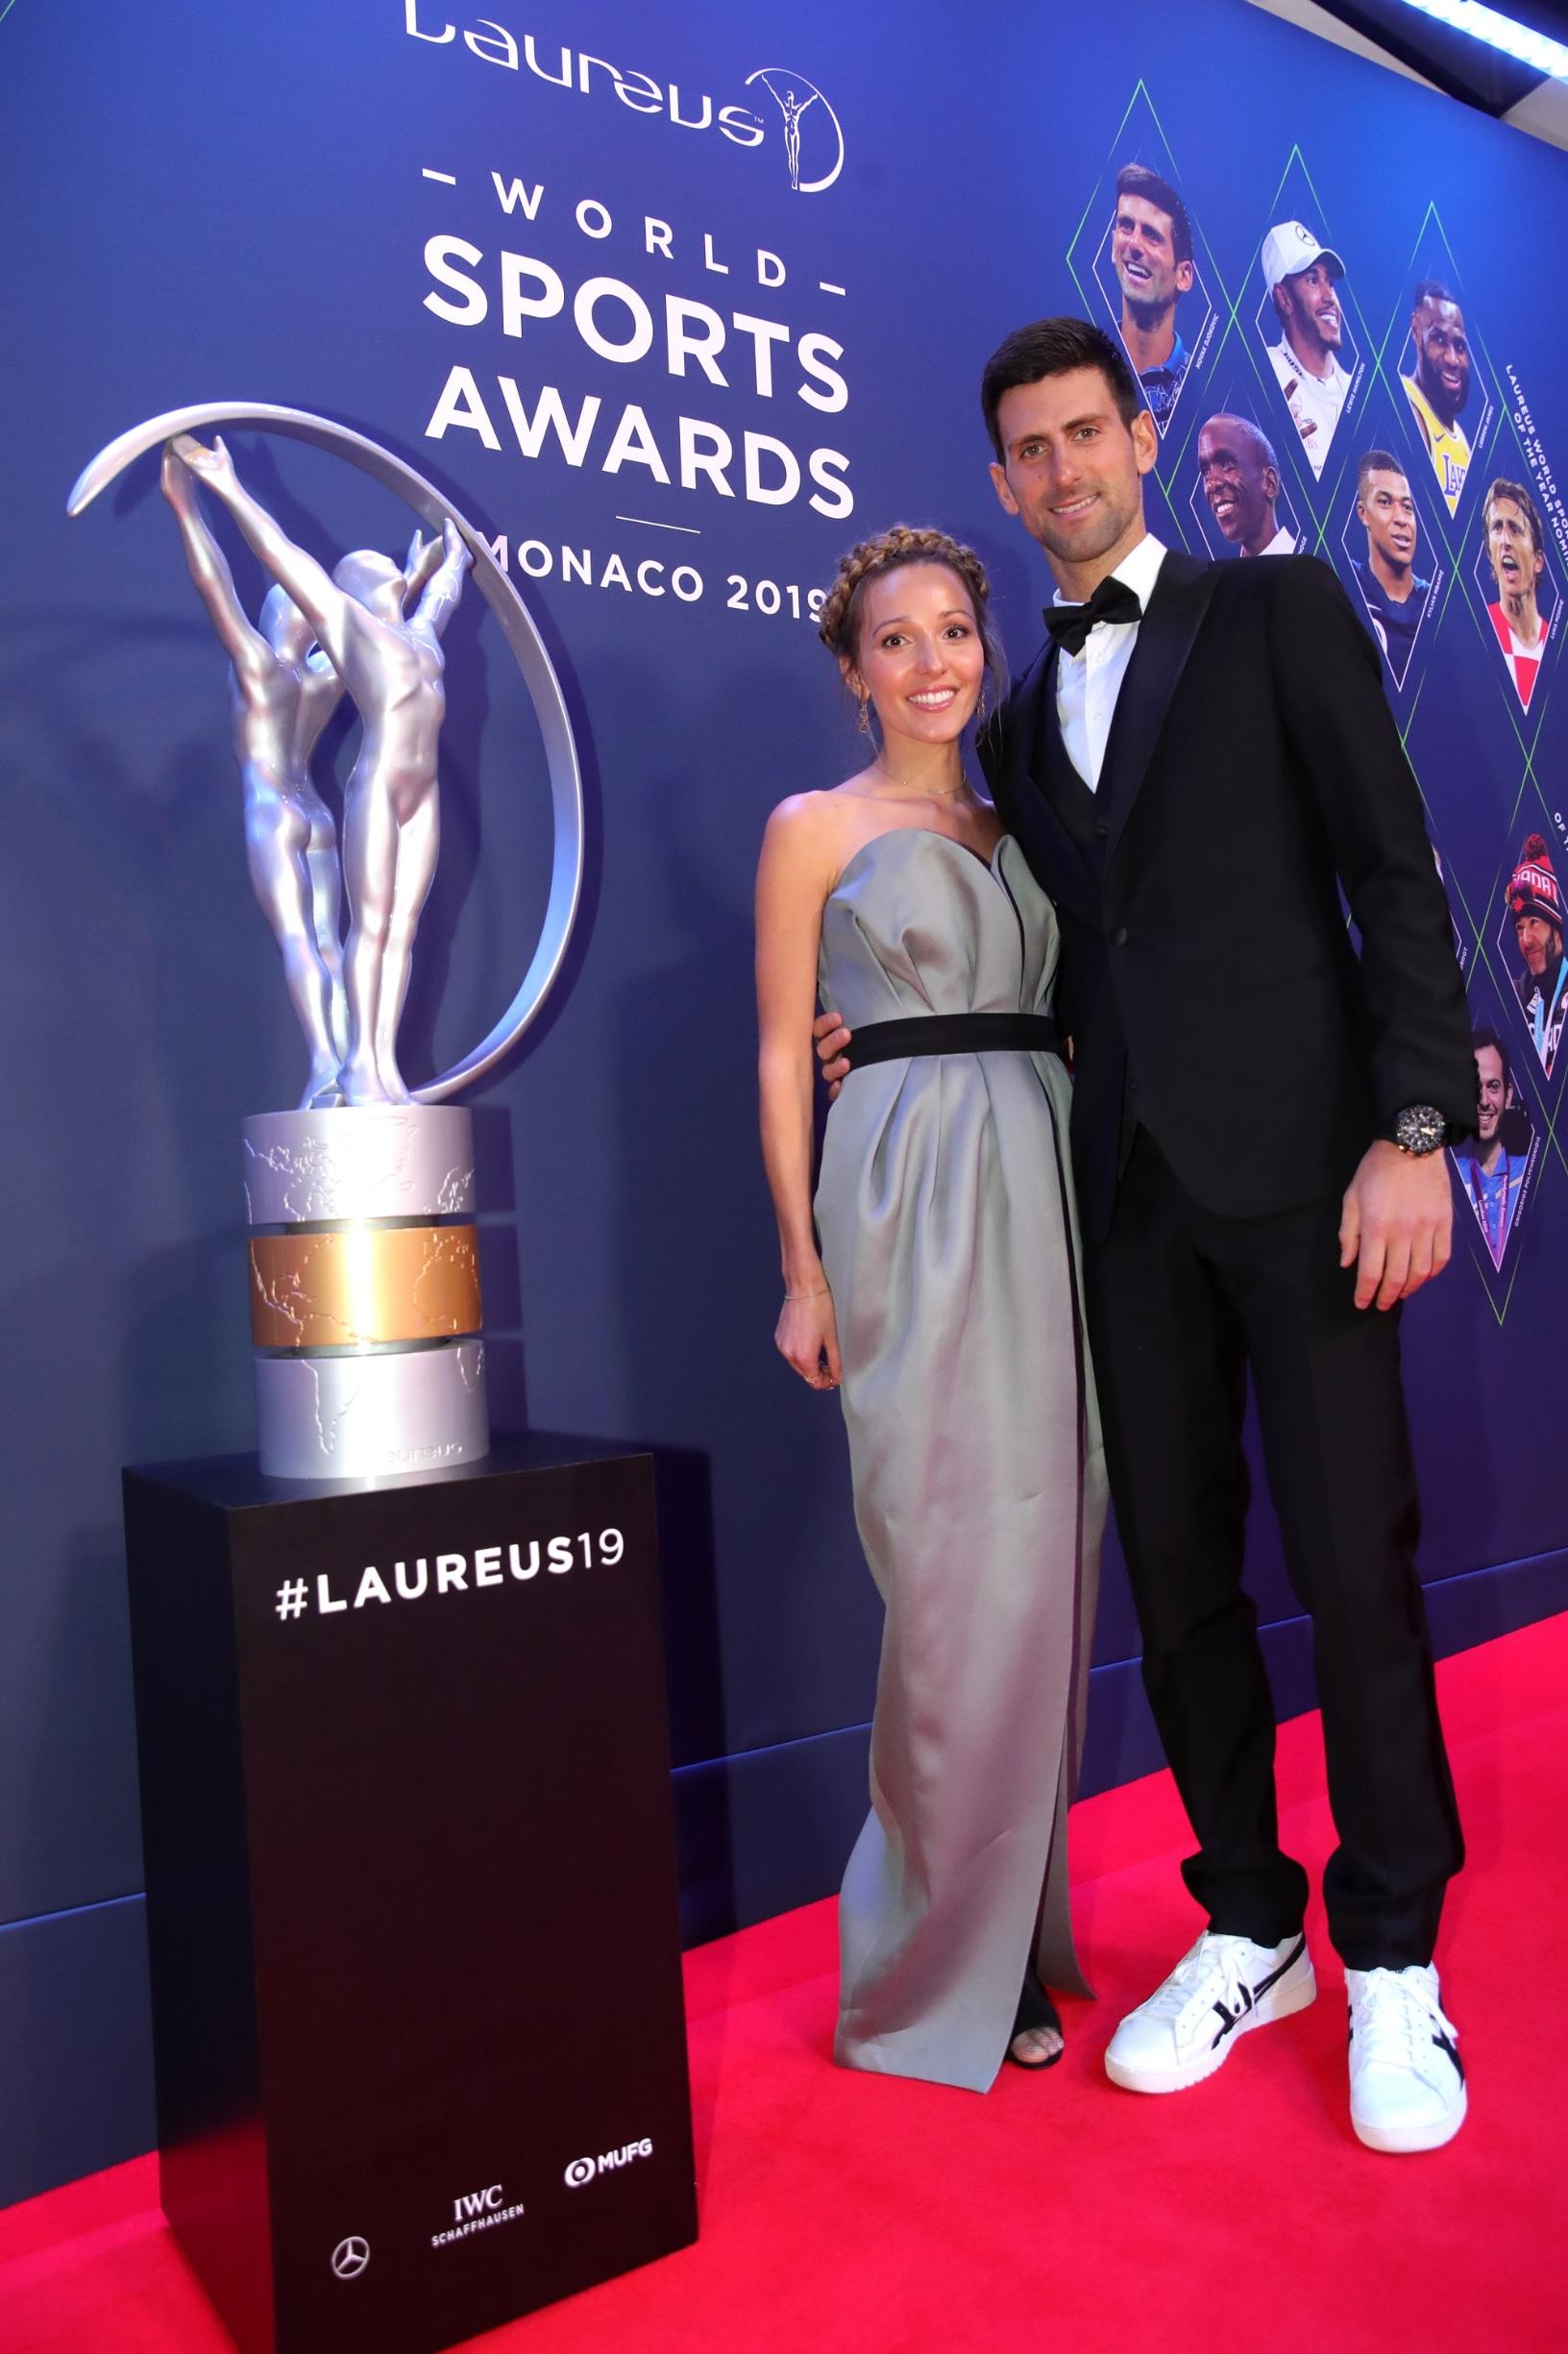 MONACO, MONACO - FEBRUARY 18:  Laureus World Sportsman of The Year 2019 Nominee Novak Djokovic and wife Jelena Djokovic during the 2019 Laureus World Sports Awards on February 18, 2019 in Monaco, Monaco. (Photo by Alexander Hassenstein/Getty Images for Laureus)